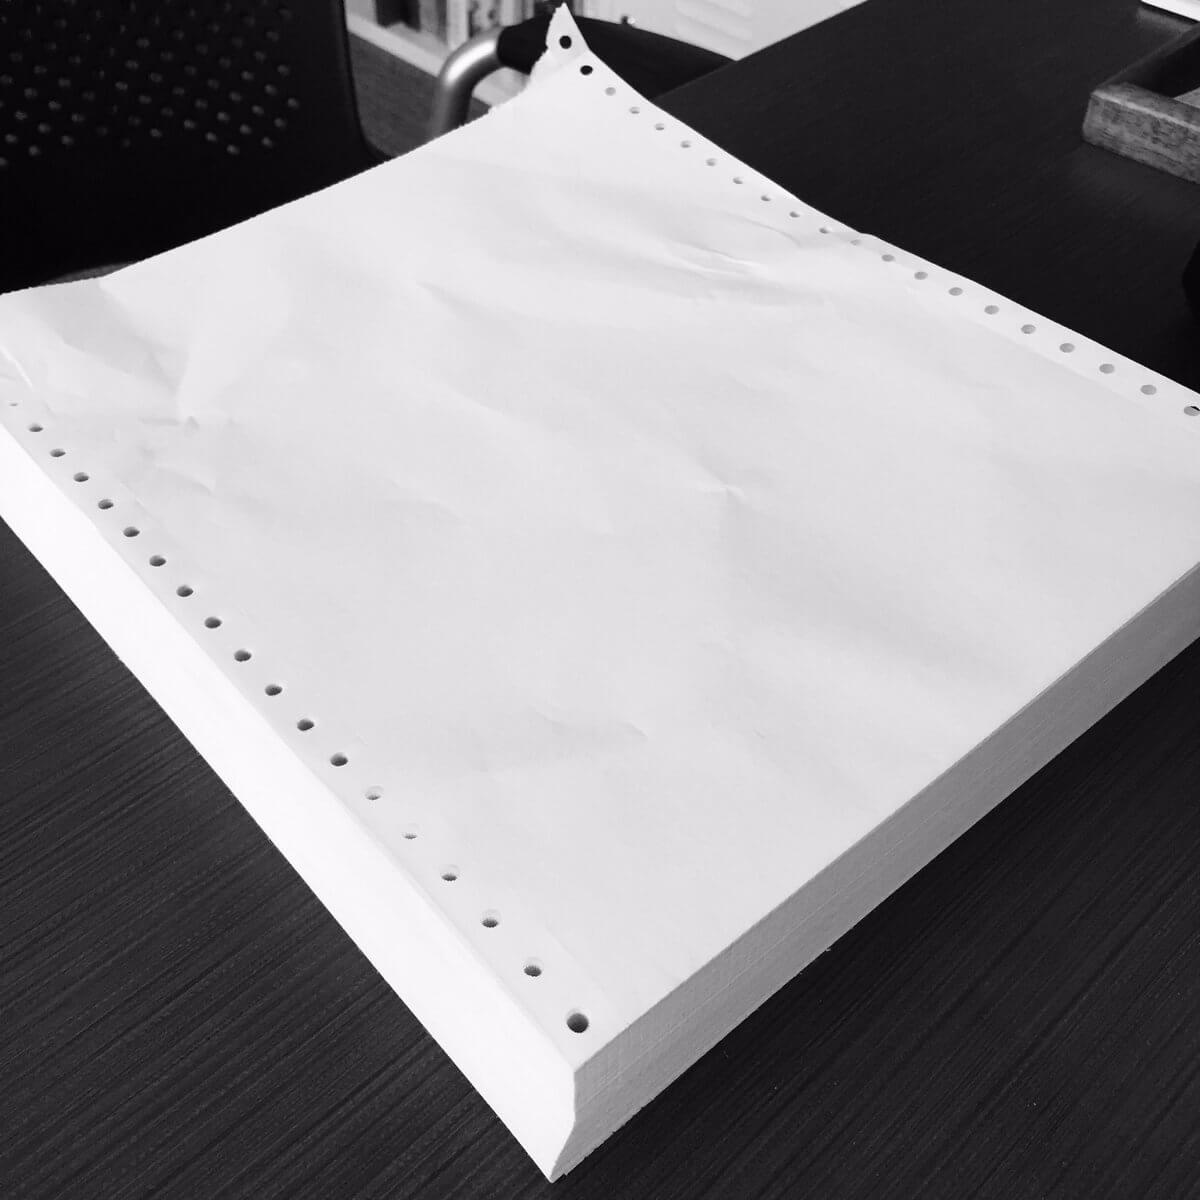 dot matrix paper.jpg